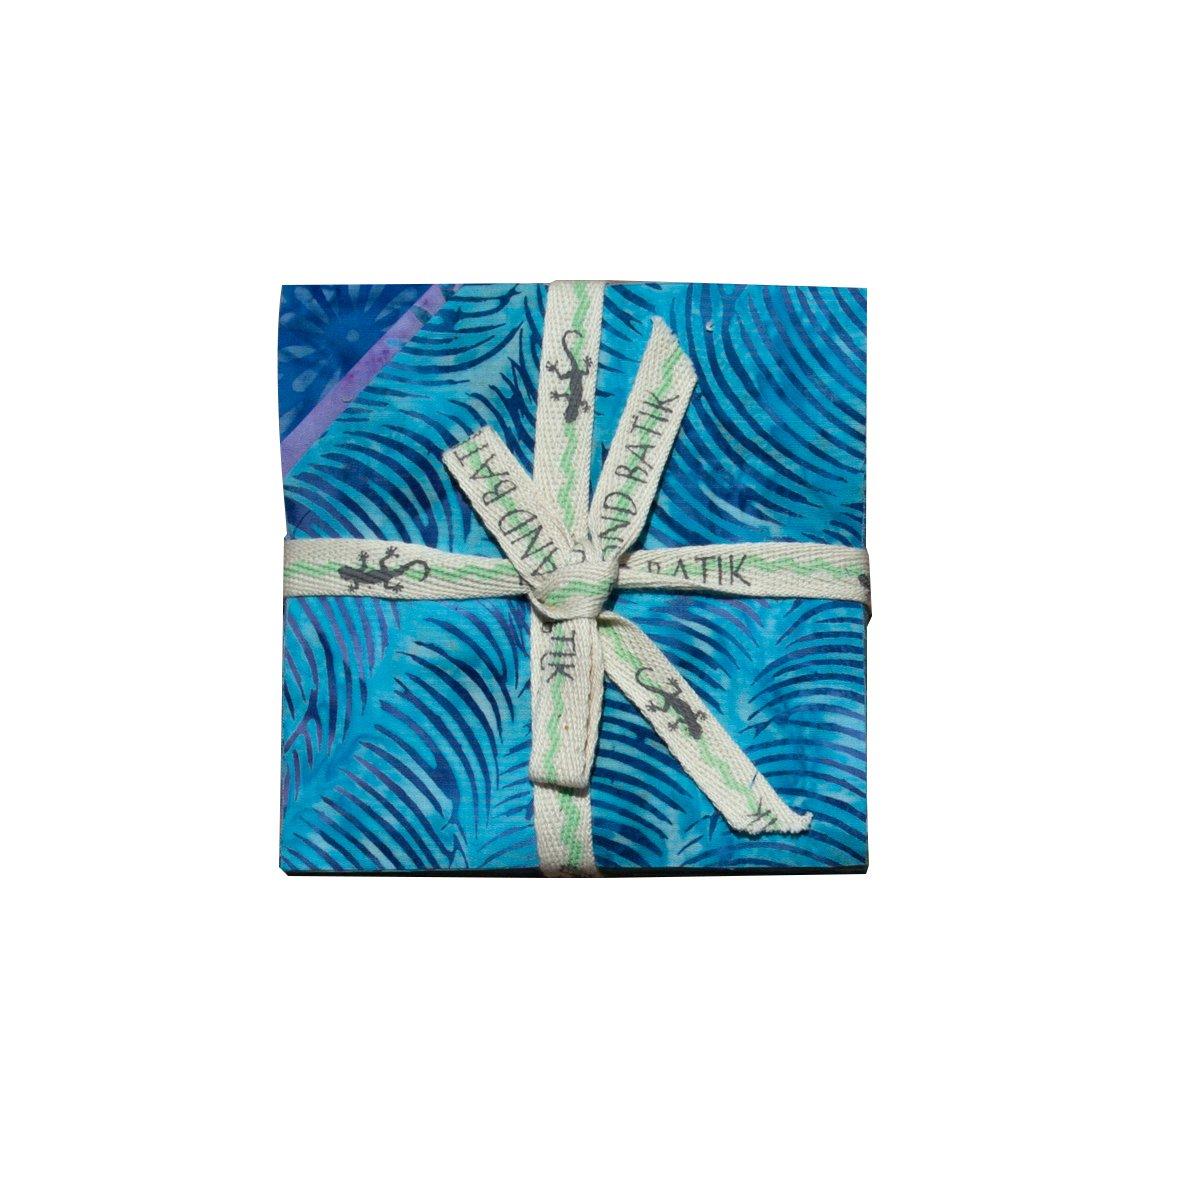 Island Batik - Drizzle Stamp 5 precut